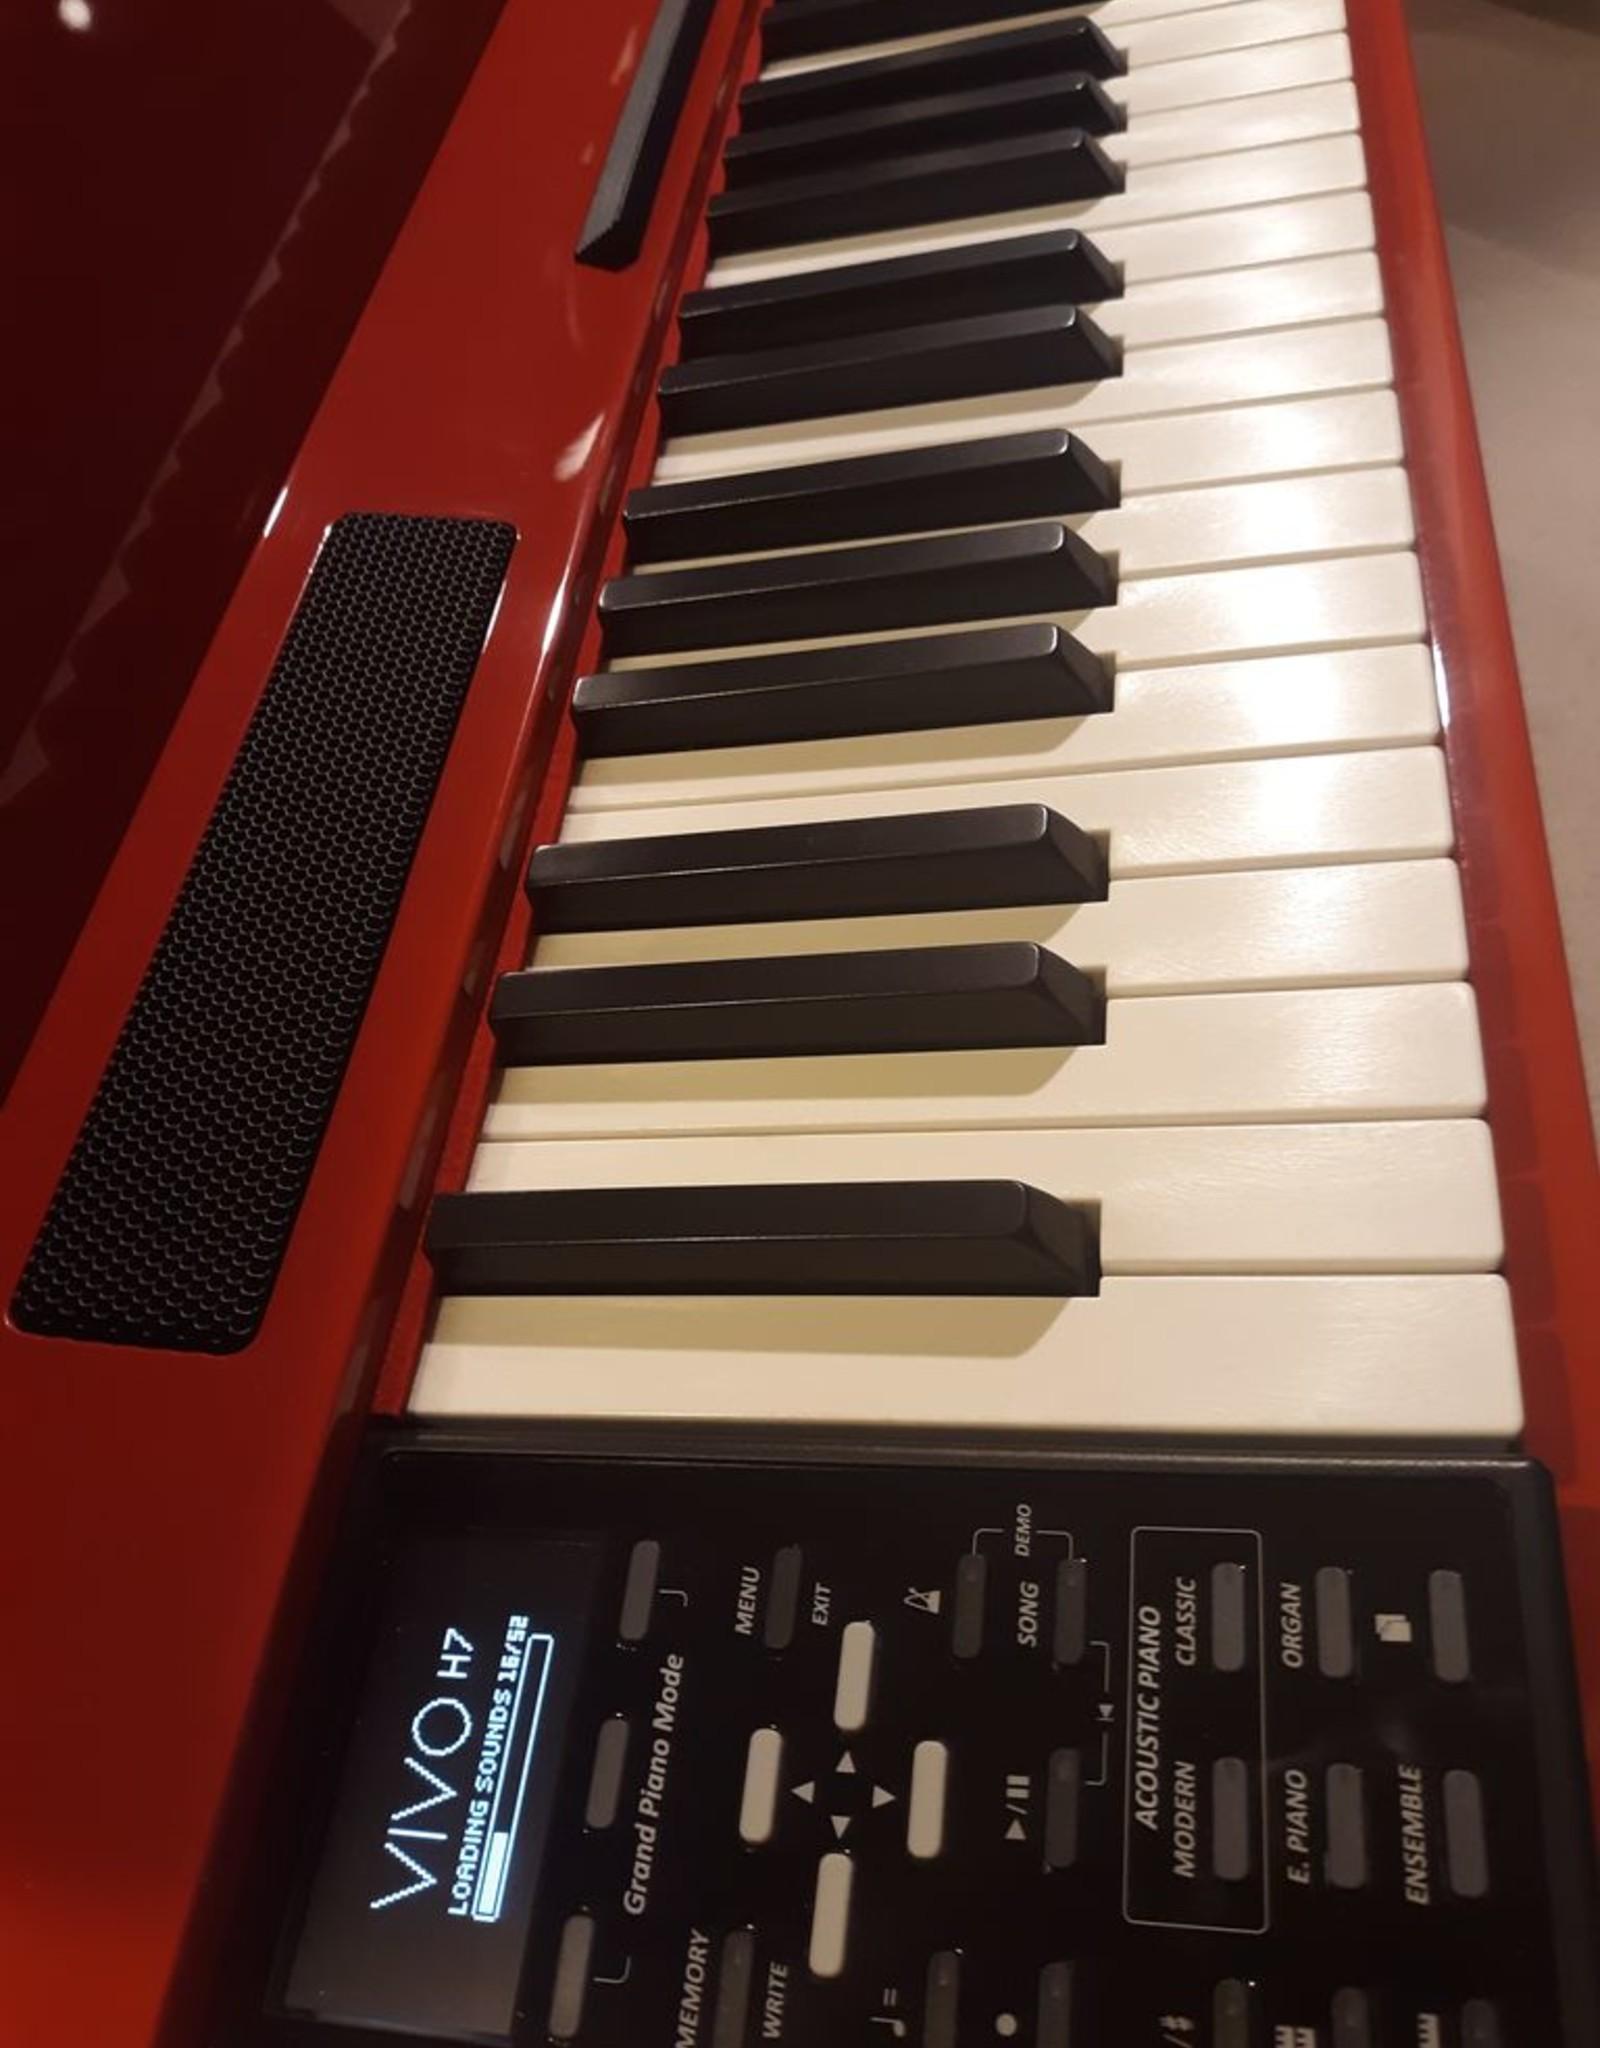 Dexibell Dexibell VIVO H7 Ferrari Red Polished